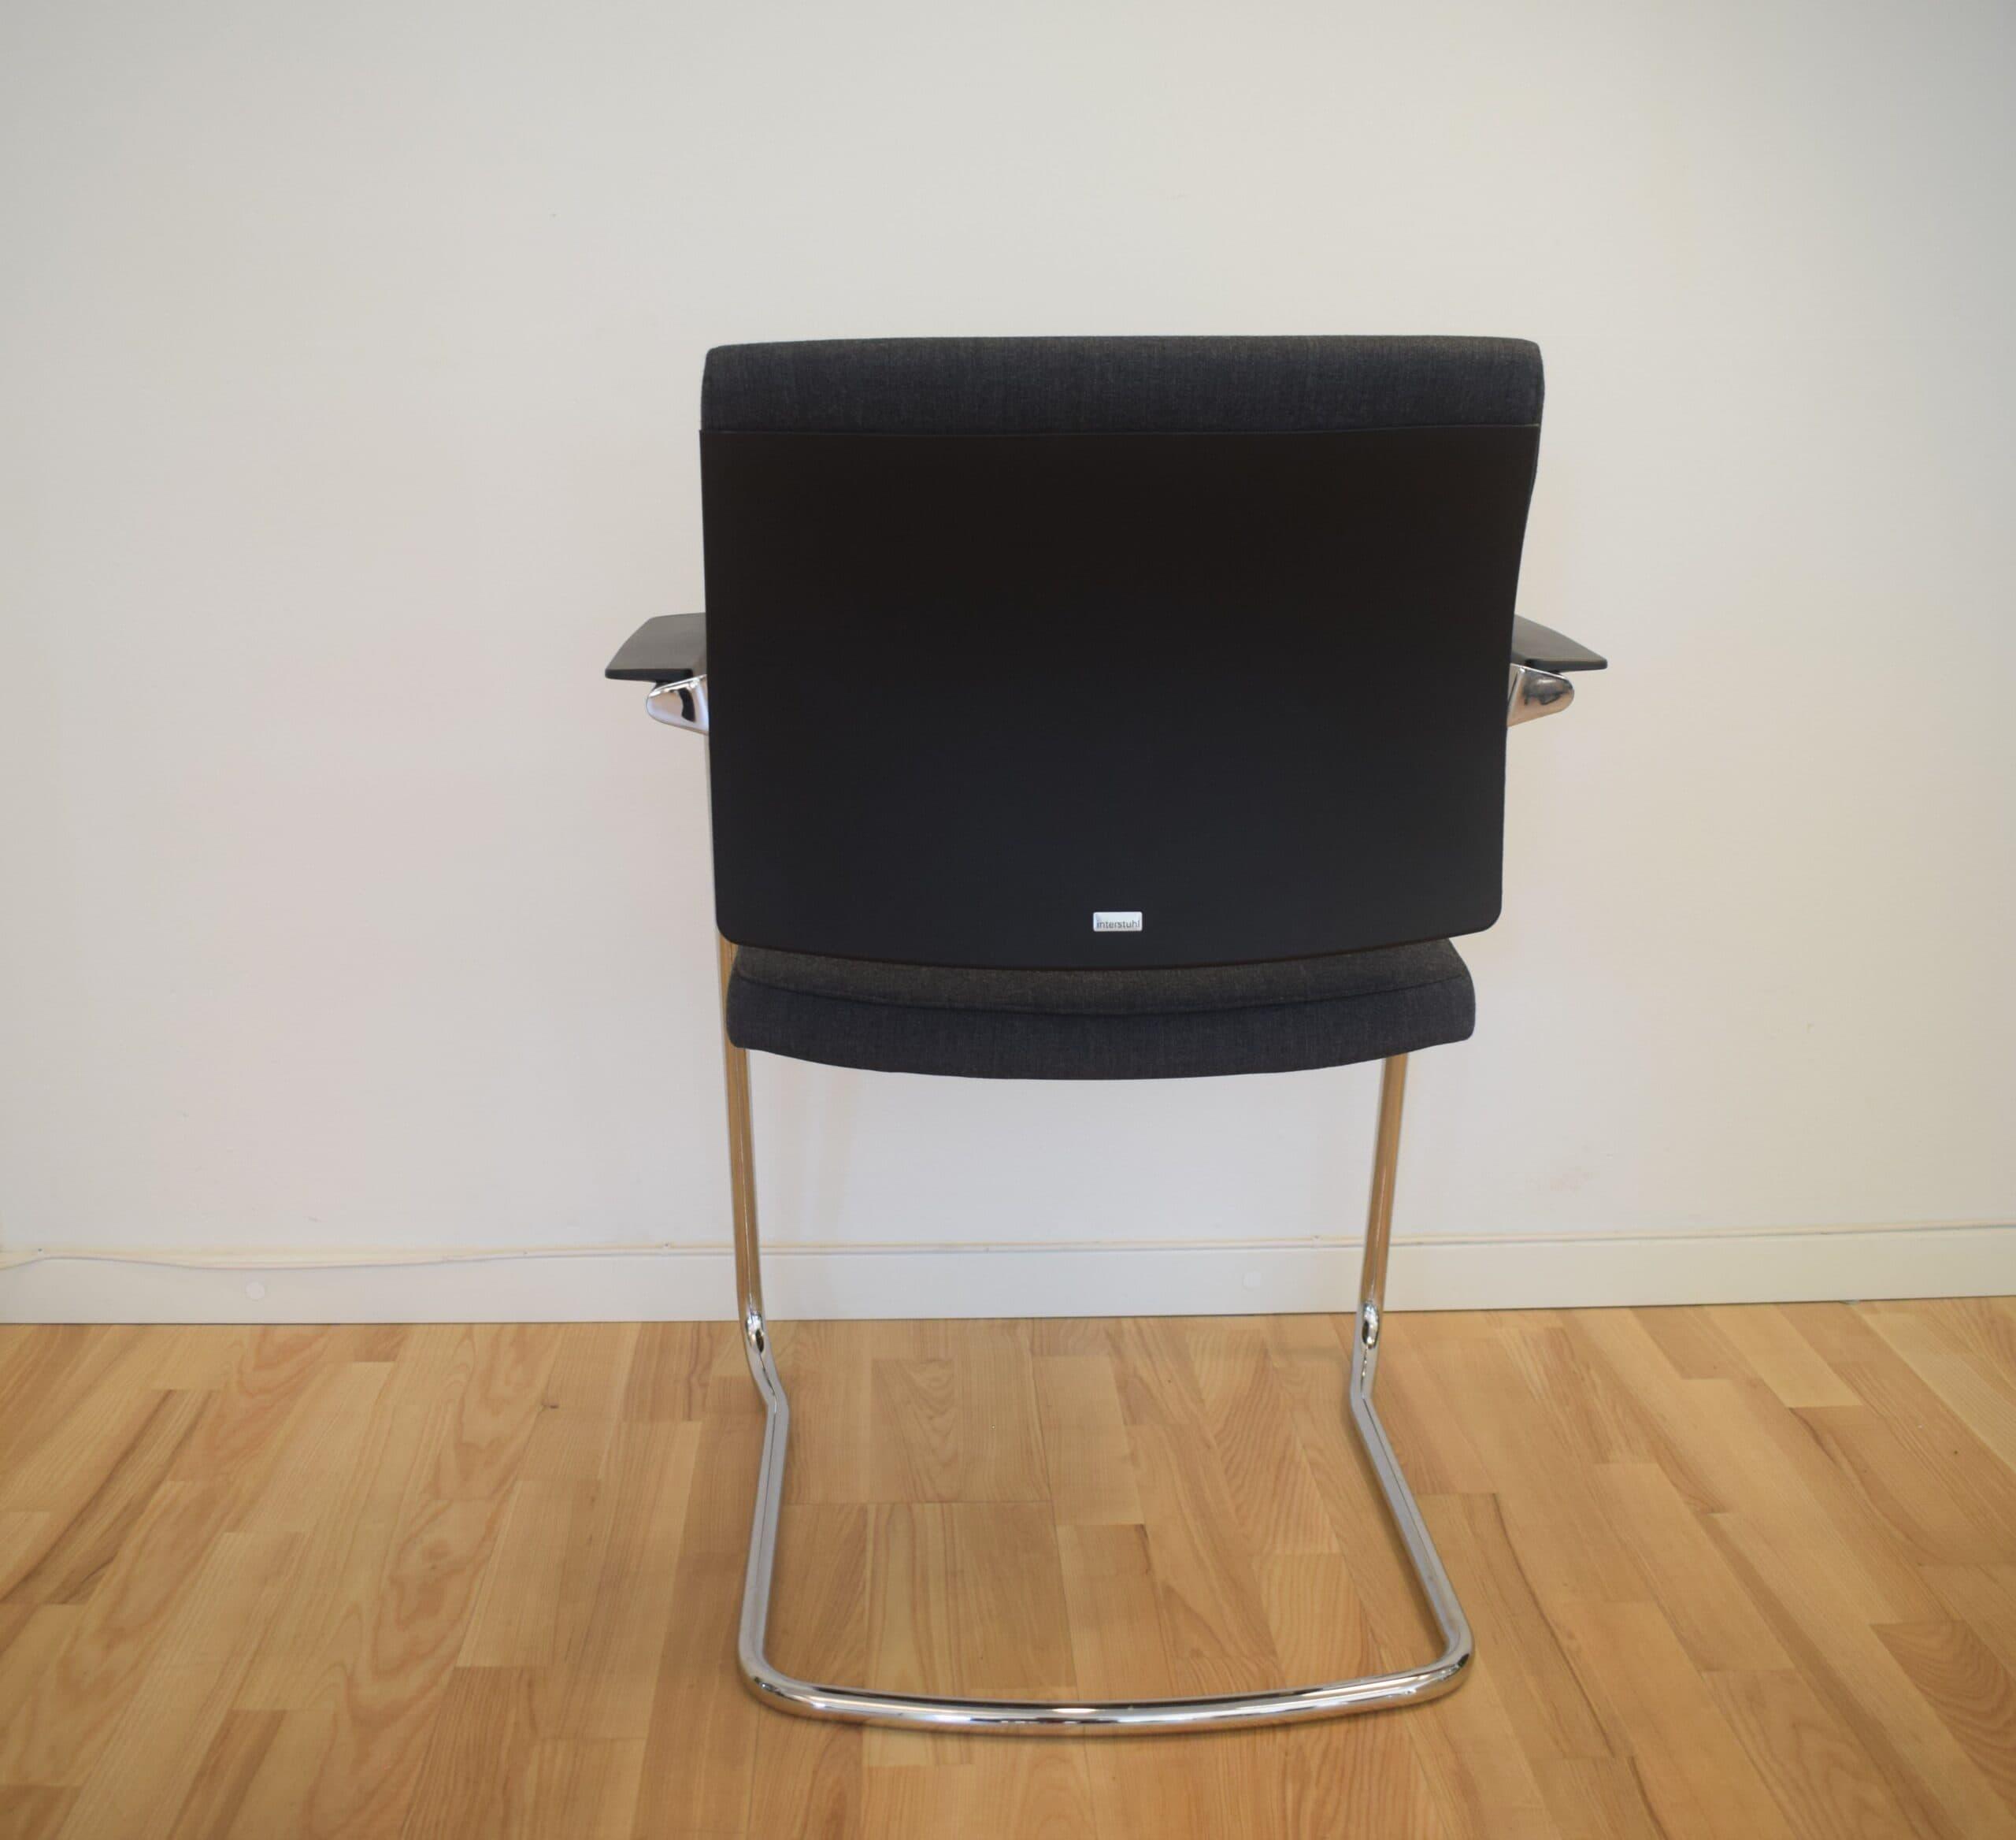 Yoster mødebordsstol - krom stel.